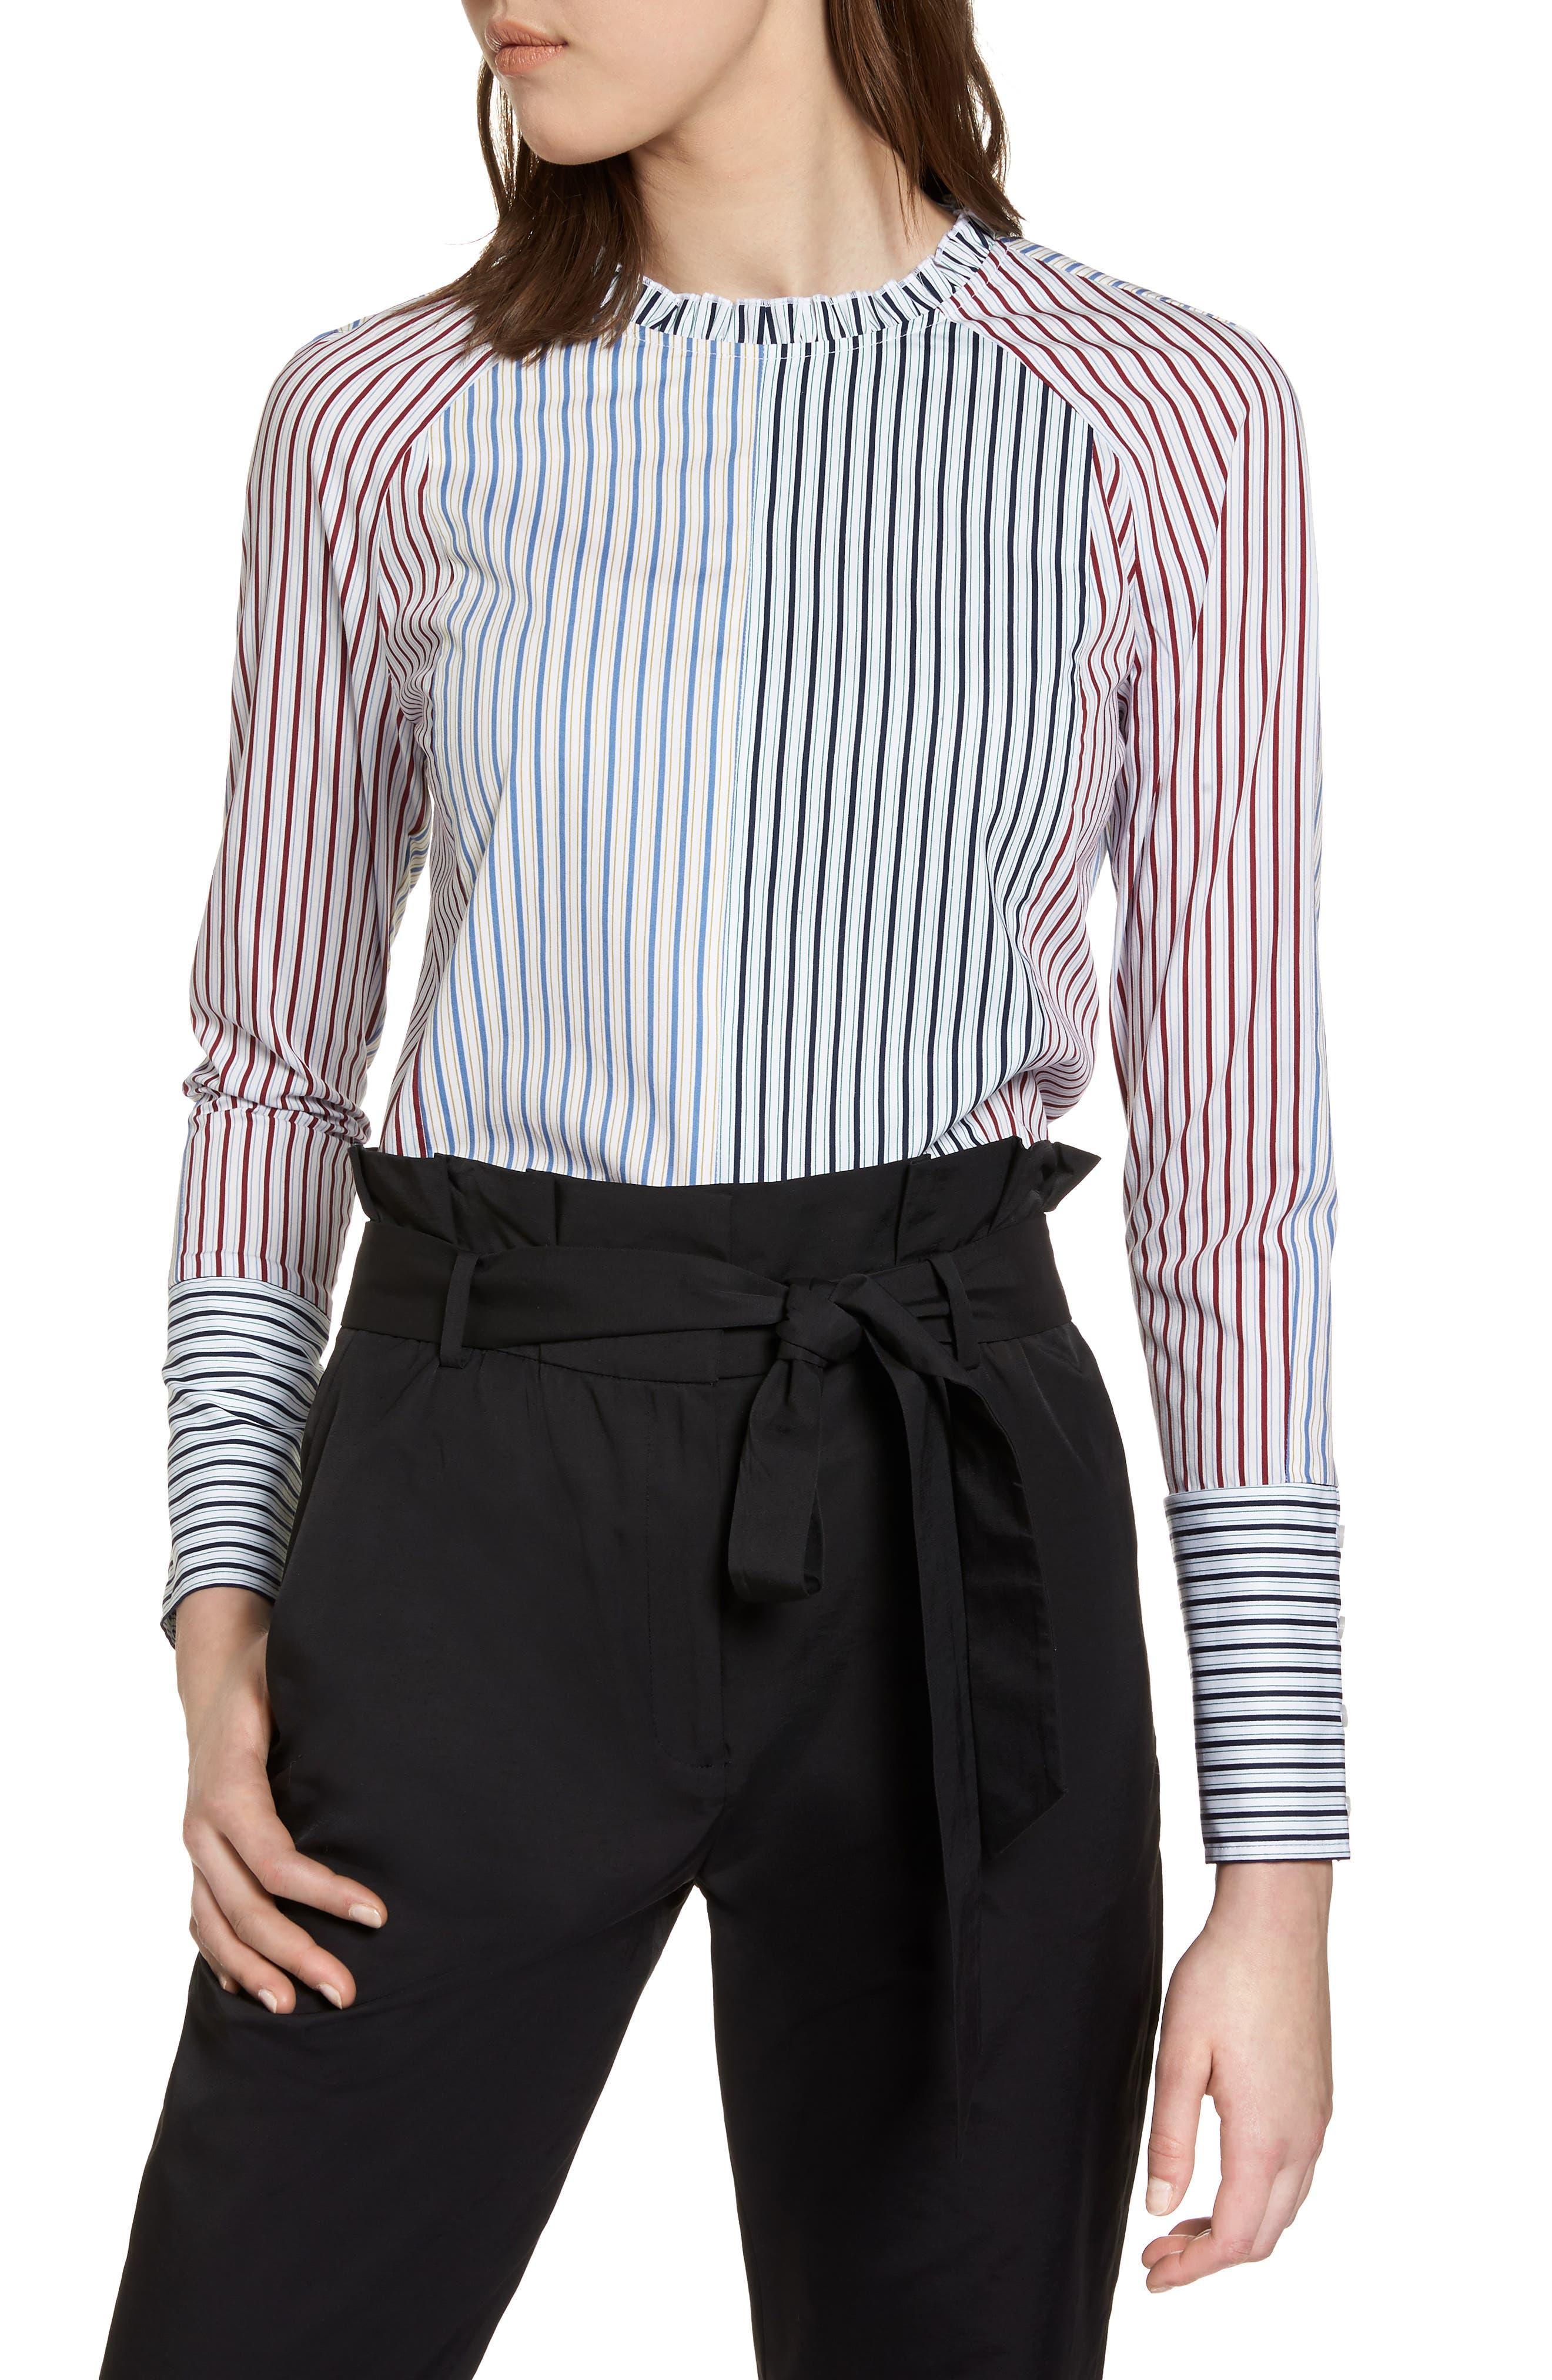 Mixed Stripe Cotton Shirt,                             Main thumbnail 1, color,                             White Multi Mix Stripe